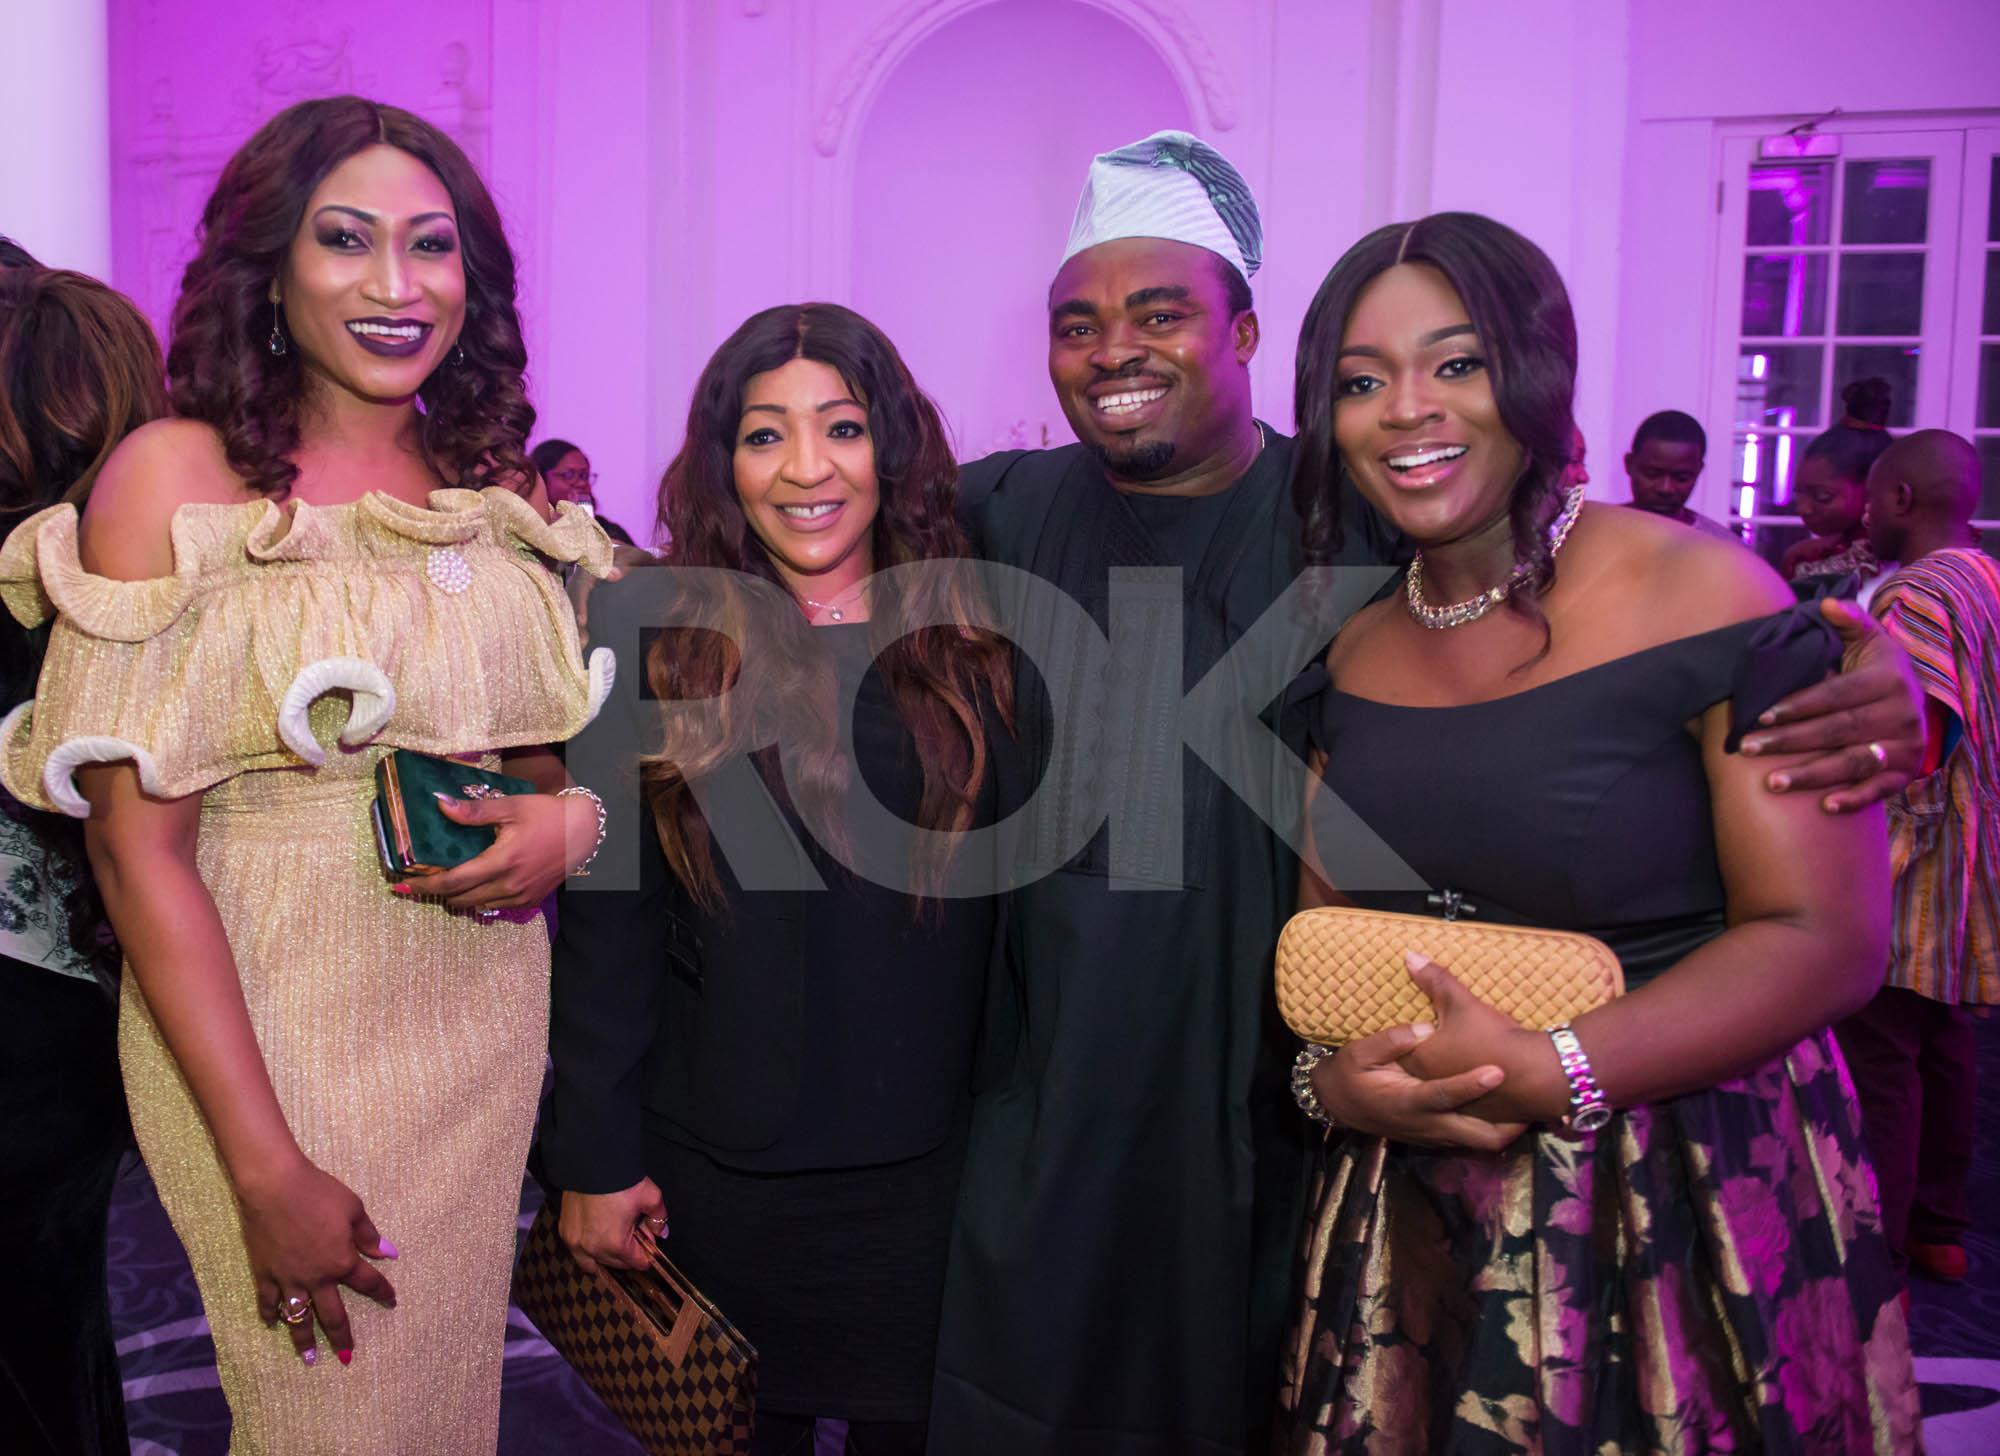 rokonsky-launch-shuts-down-london-with-mary-njoku-nollywood-stars-51